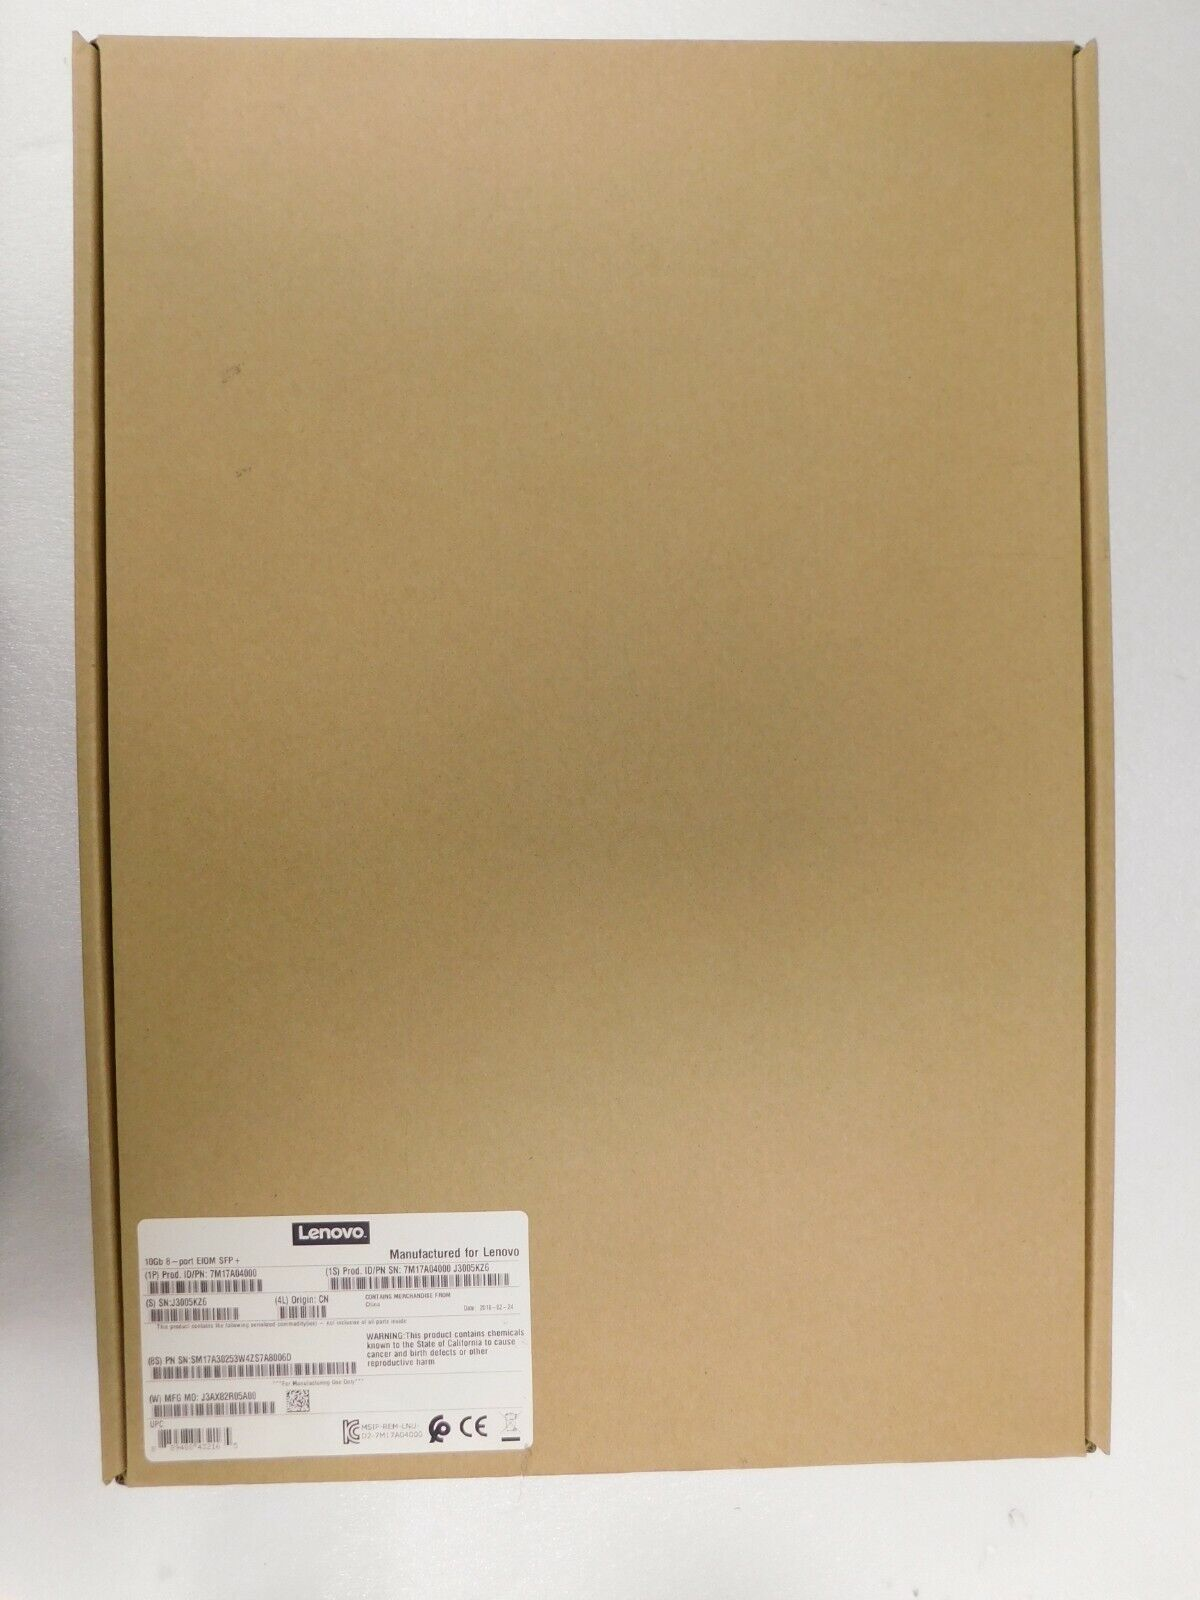 Lenovo 7M17A04000 - ThinkSystem D2 10Gb 8-port SFP+ LOM Adapter AUY9